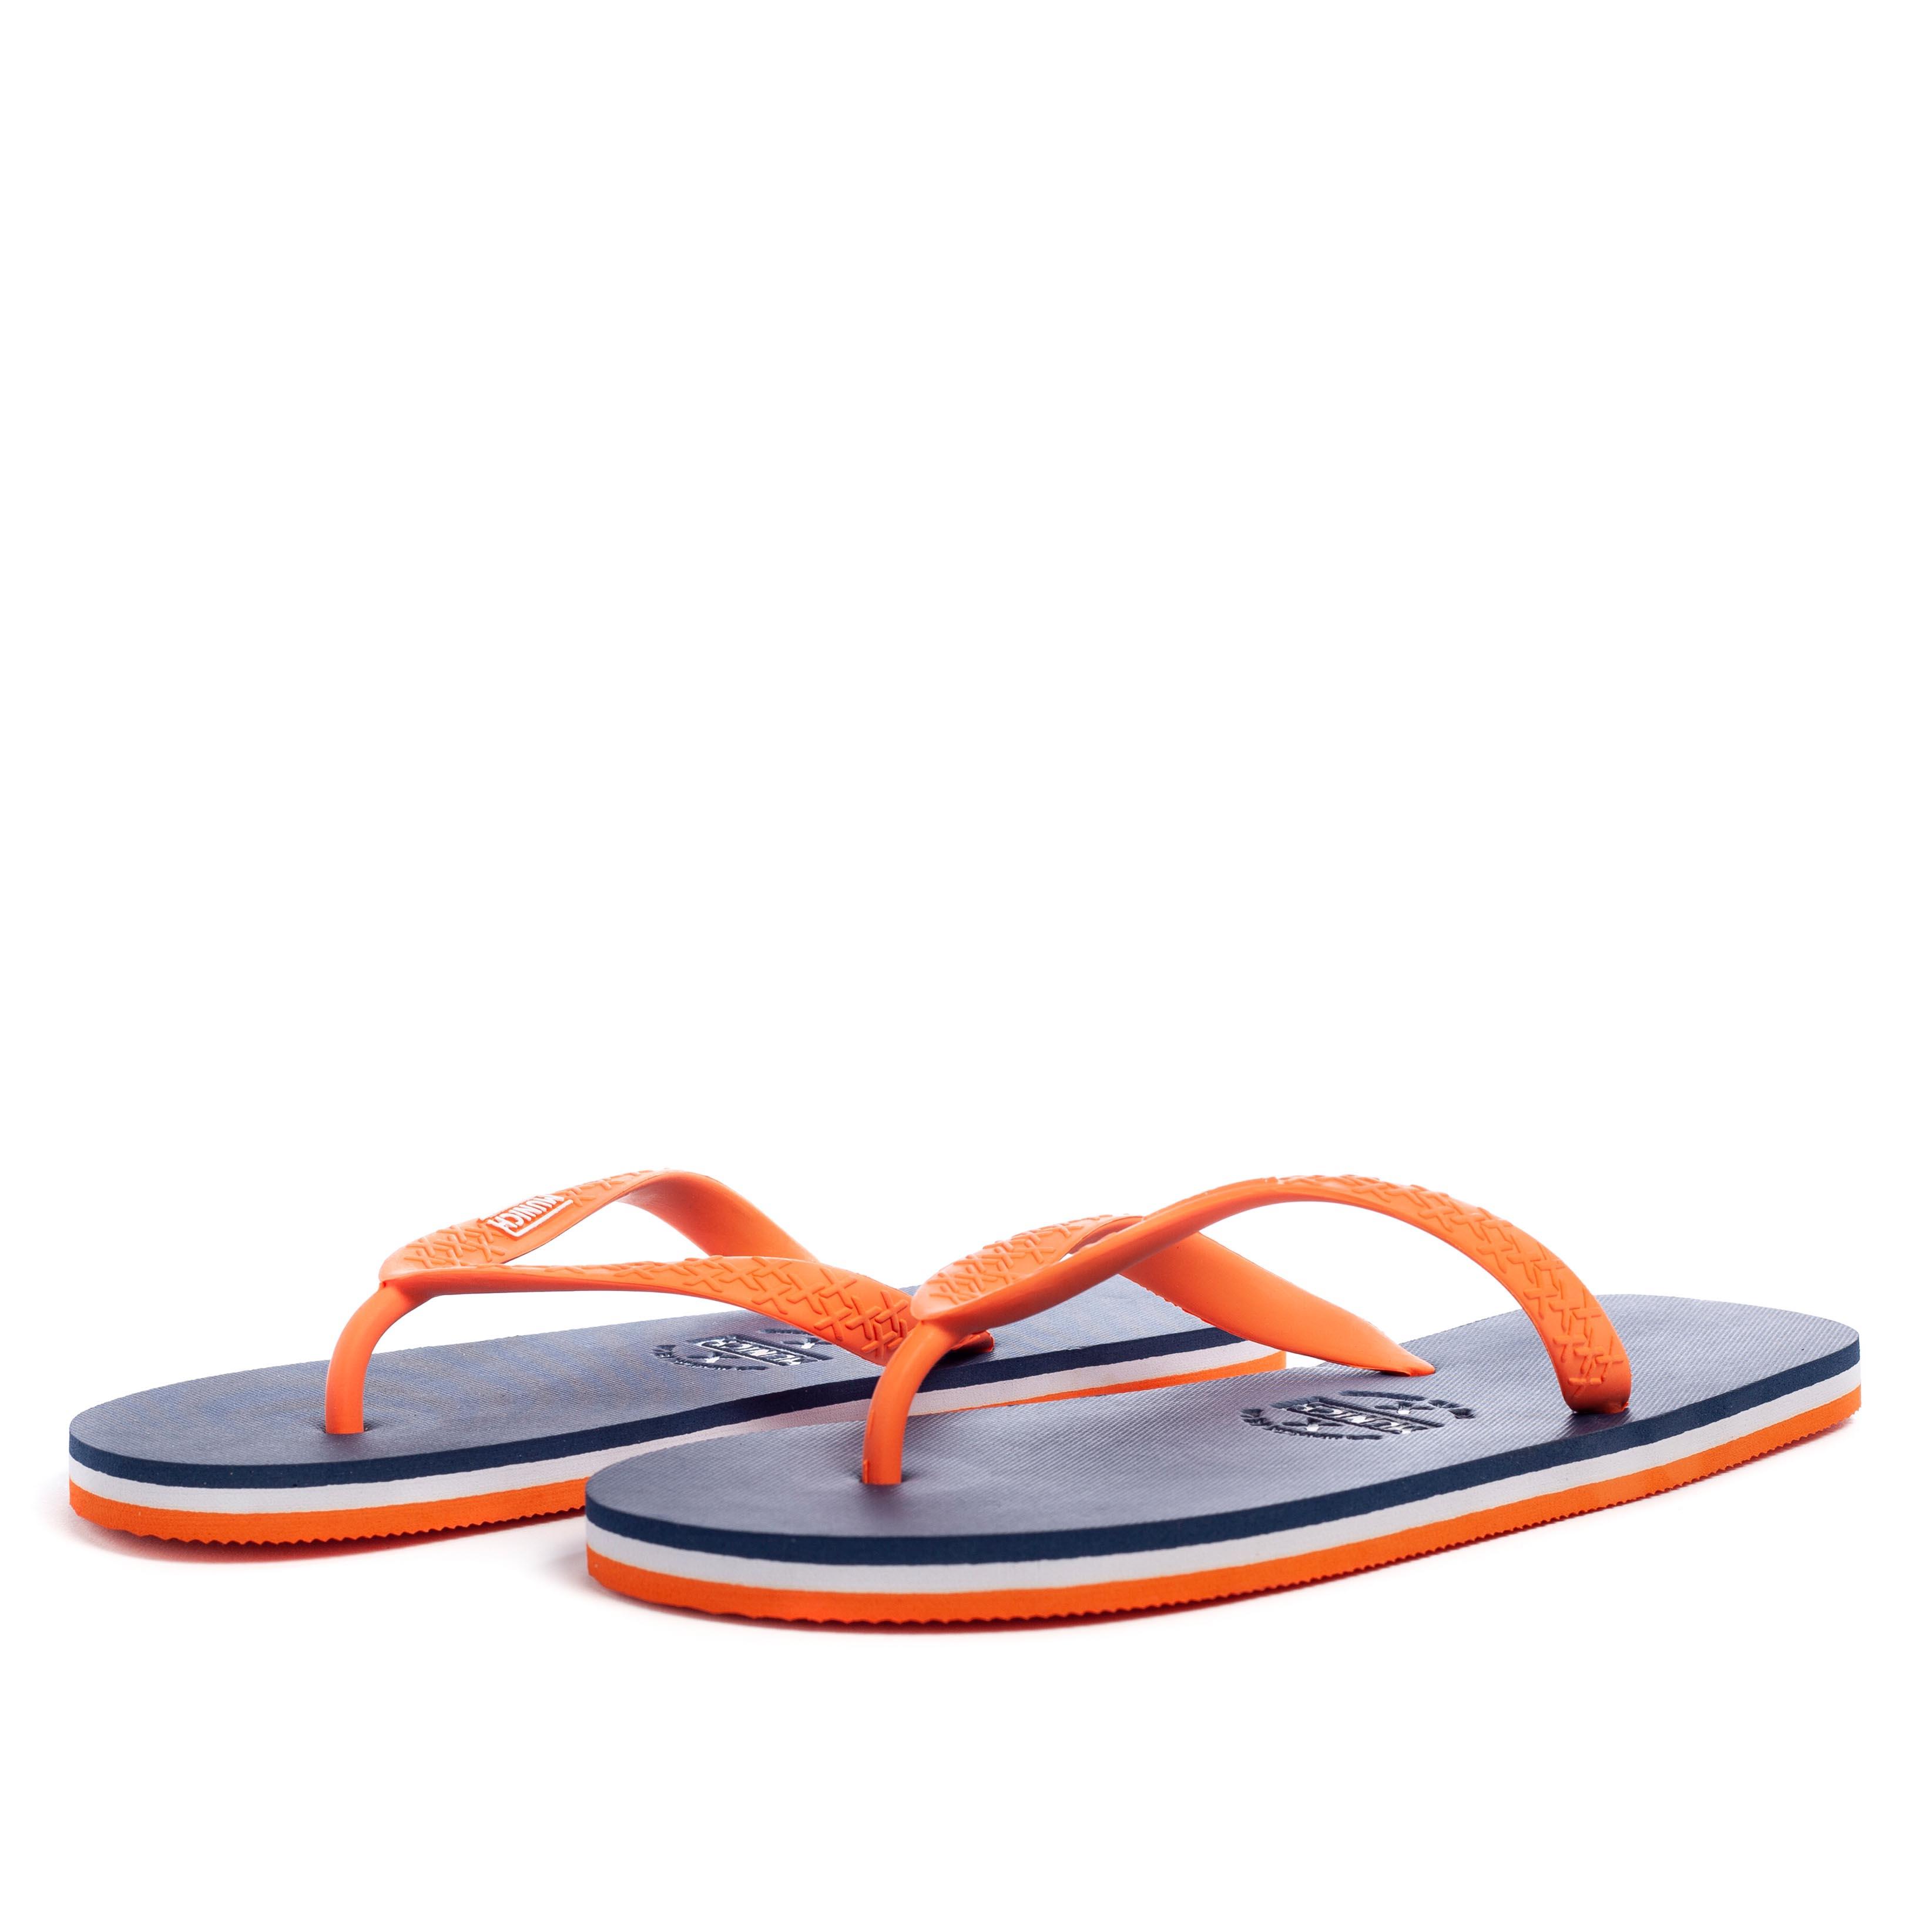 Chancla mujer - naranja/azul